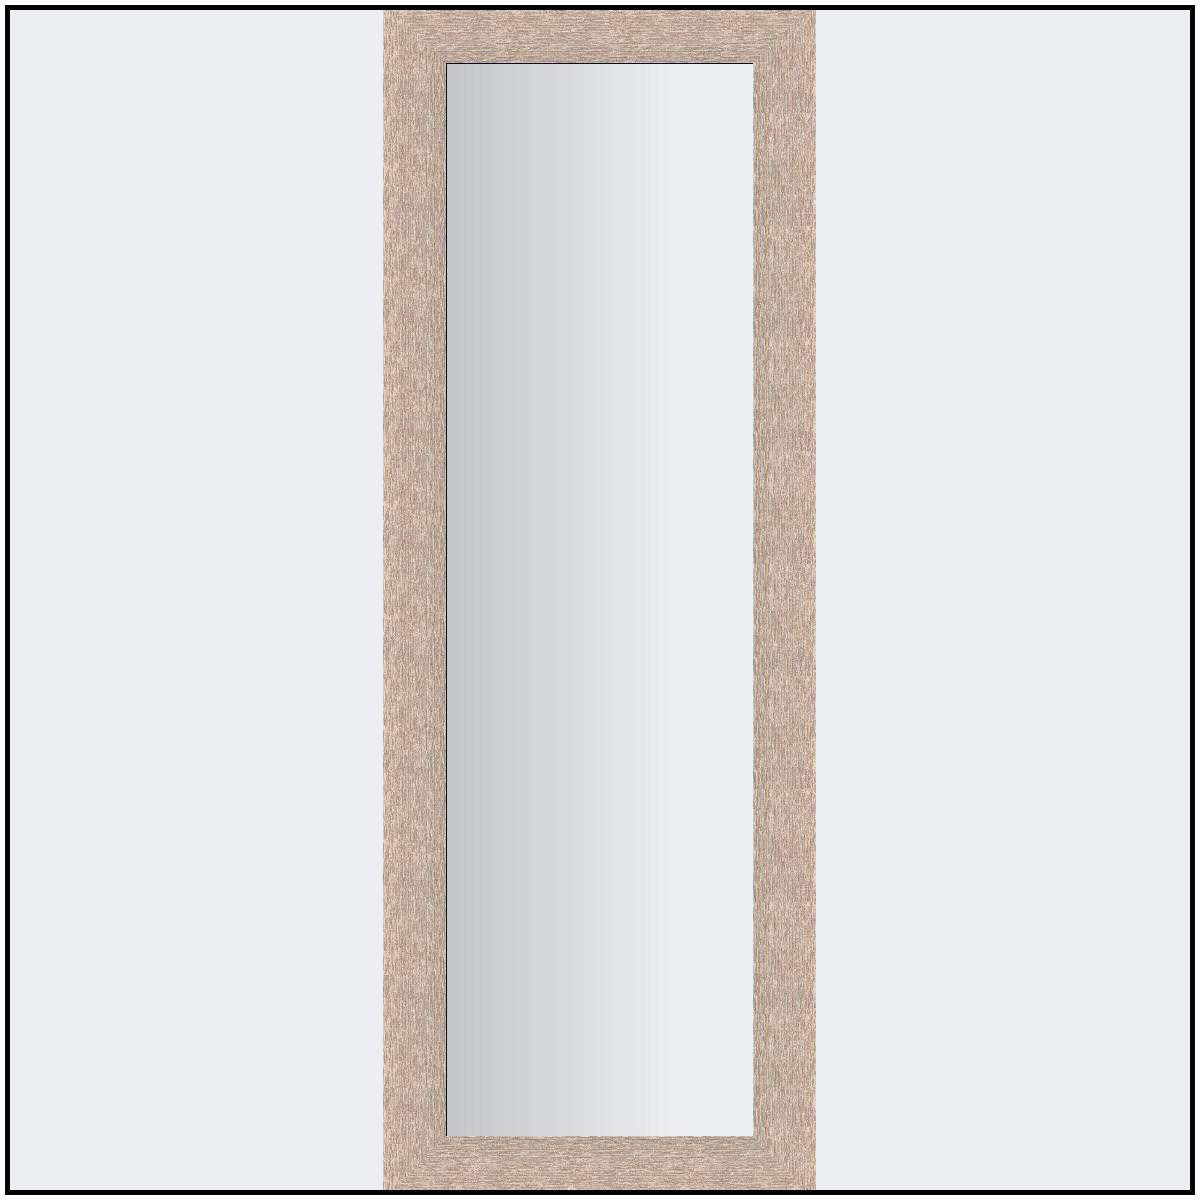 28 Miroir Sortie De Garage Leroy Merlin 2017 Home Decor Curtains Decor